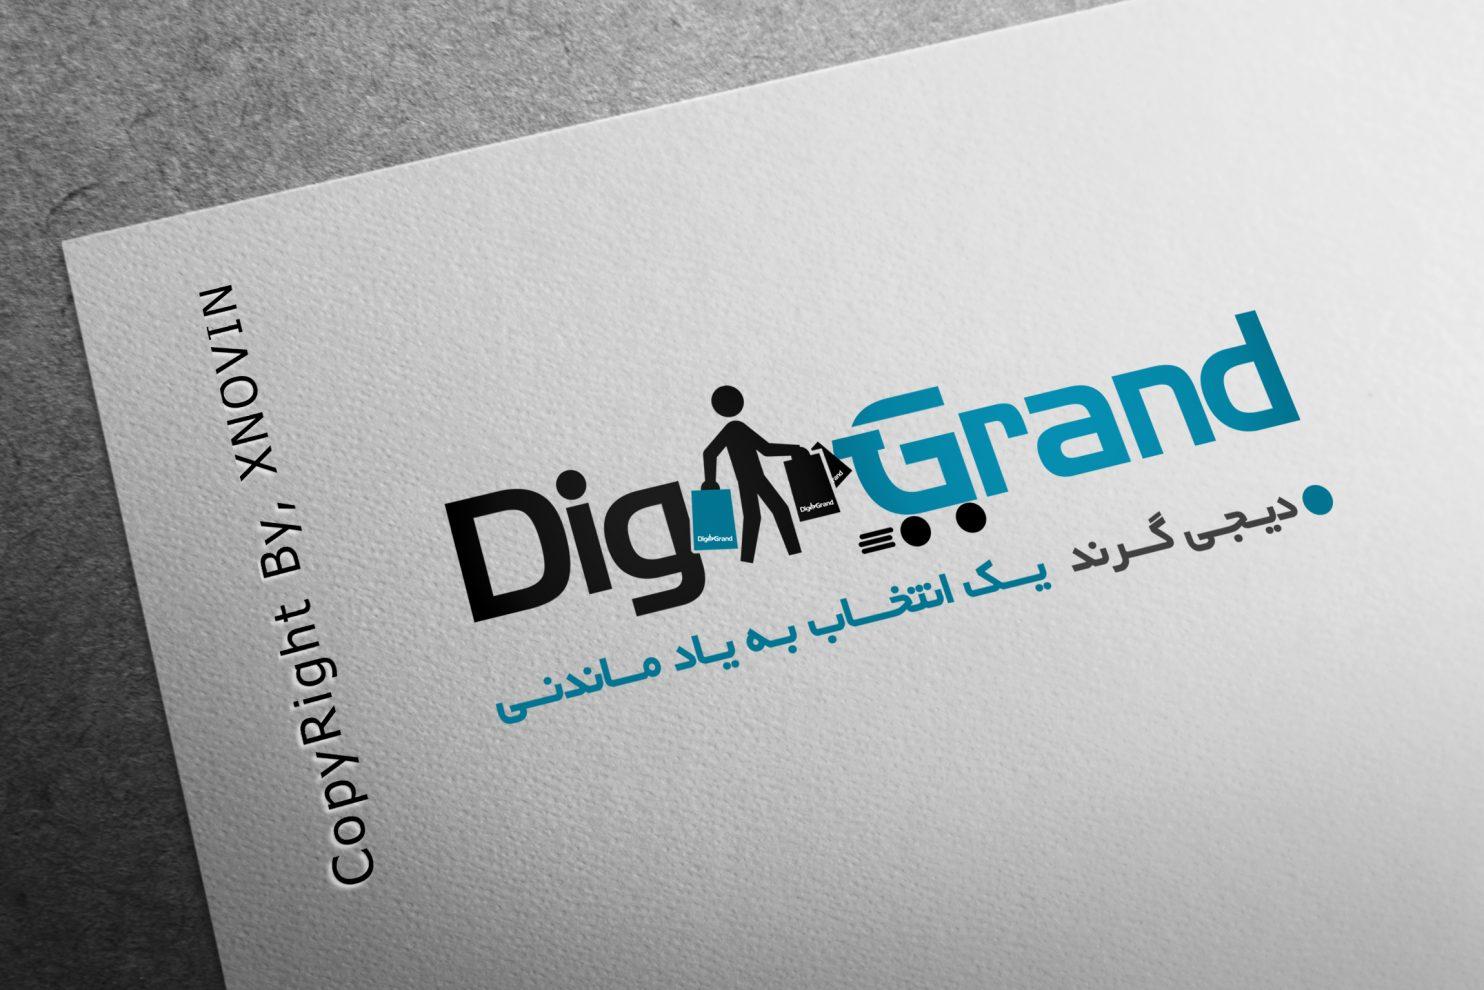 DigiGrand Logo 1484x990 - طراحی و ساخت وبسایت دیجی گرند